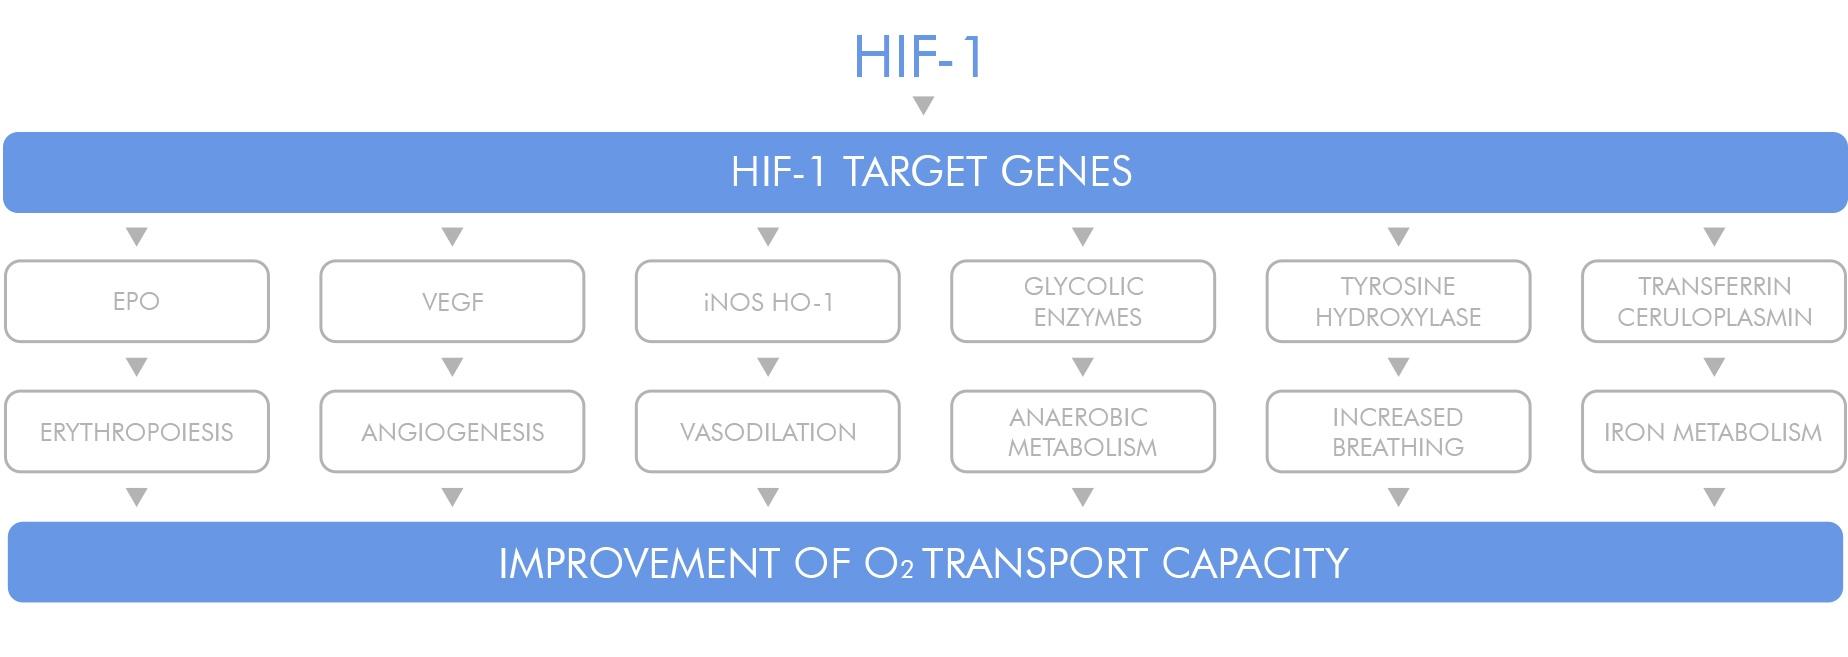 HIF-1